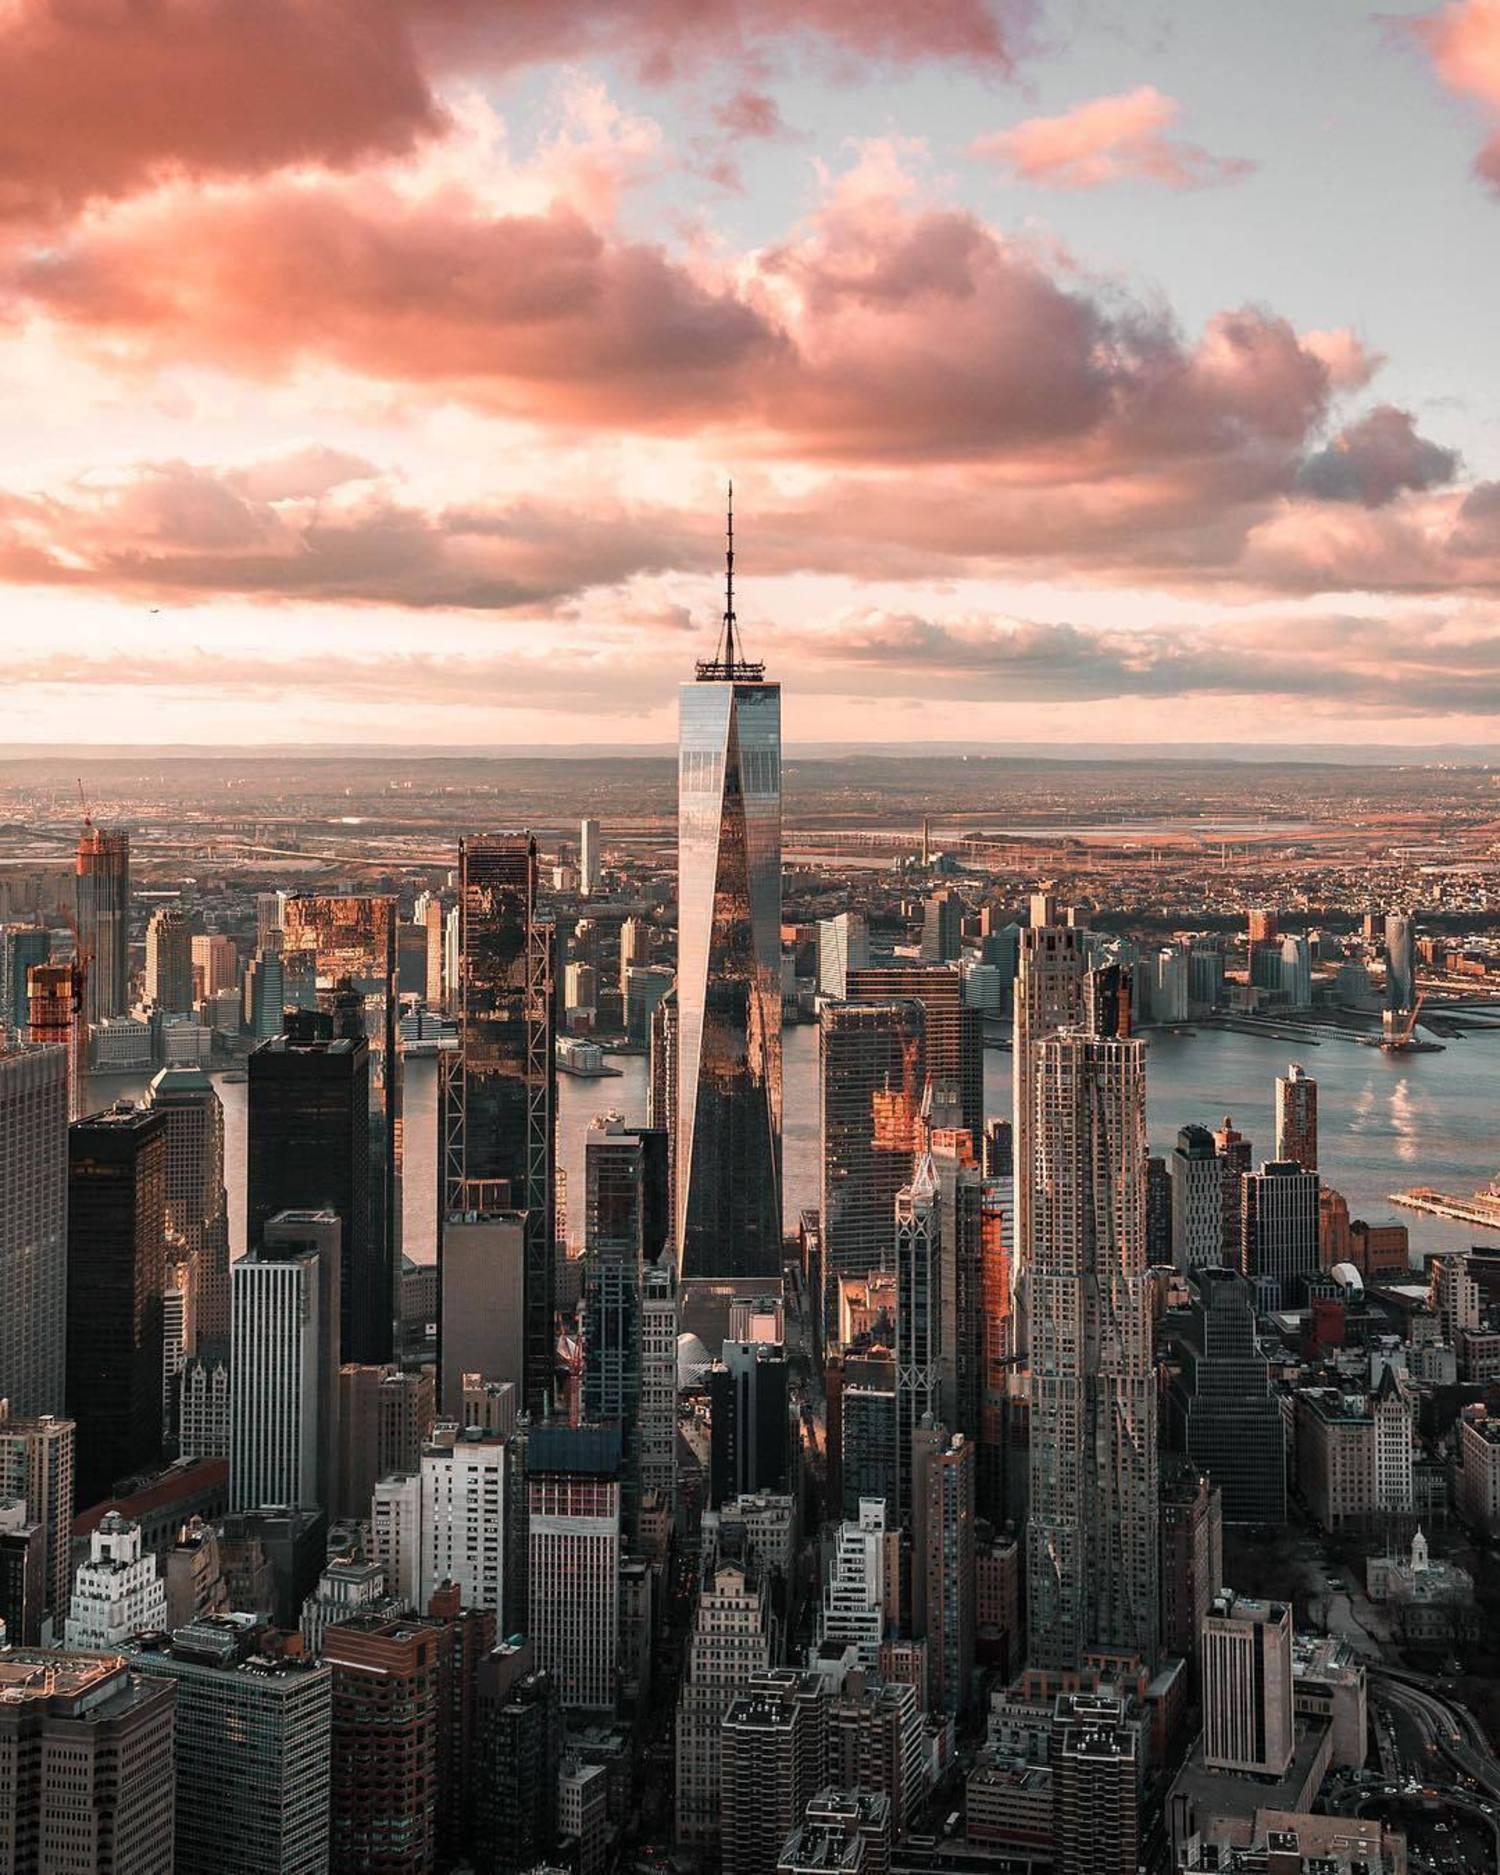 New York, New York. Photo via @joethommas #viewingnyc #nyc #newyork #newyorkcity